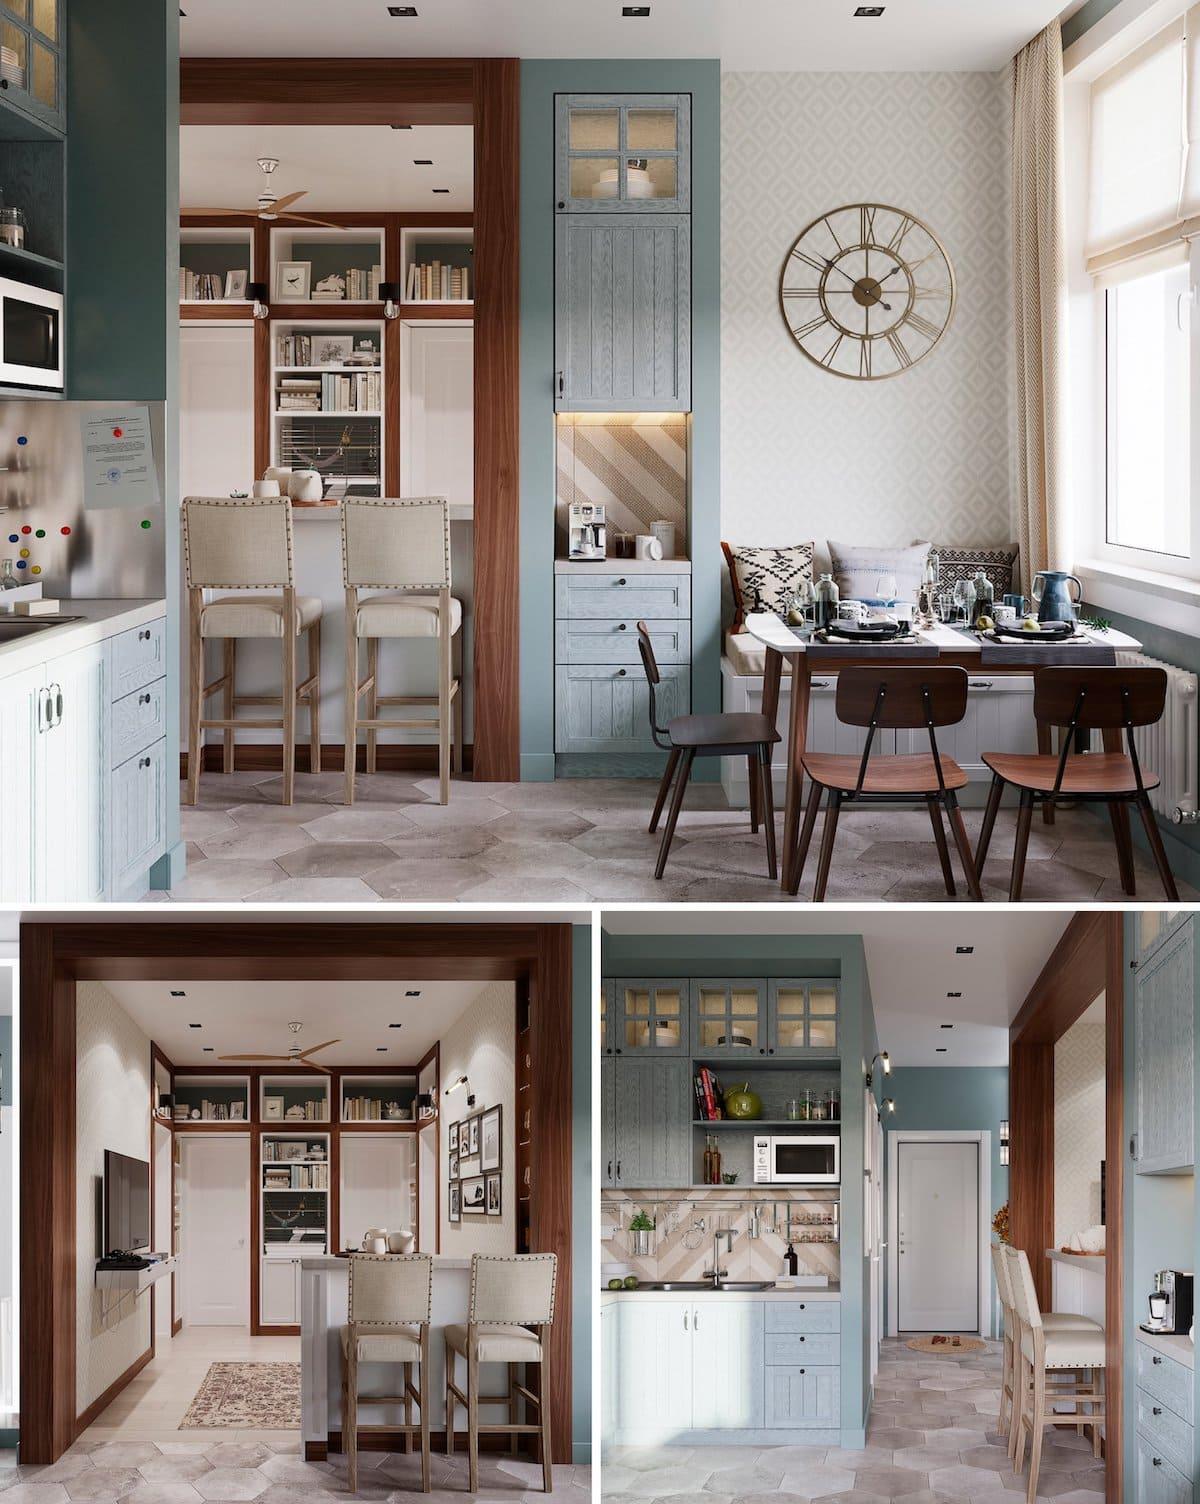 модный дизайн интерьера квартиры фото 72